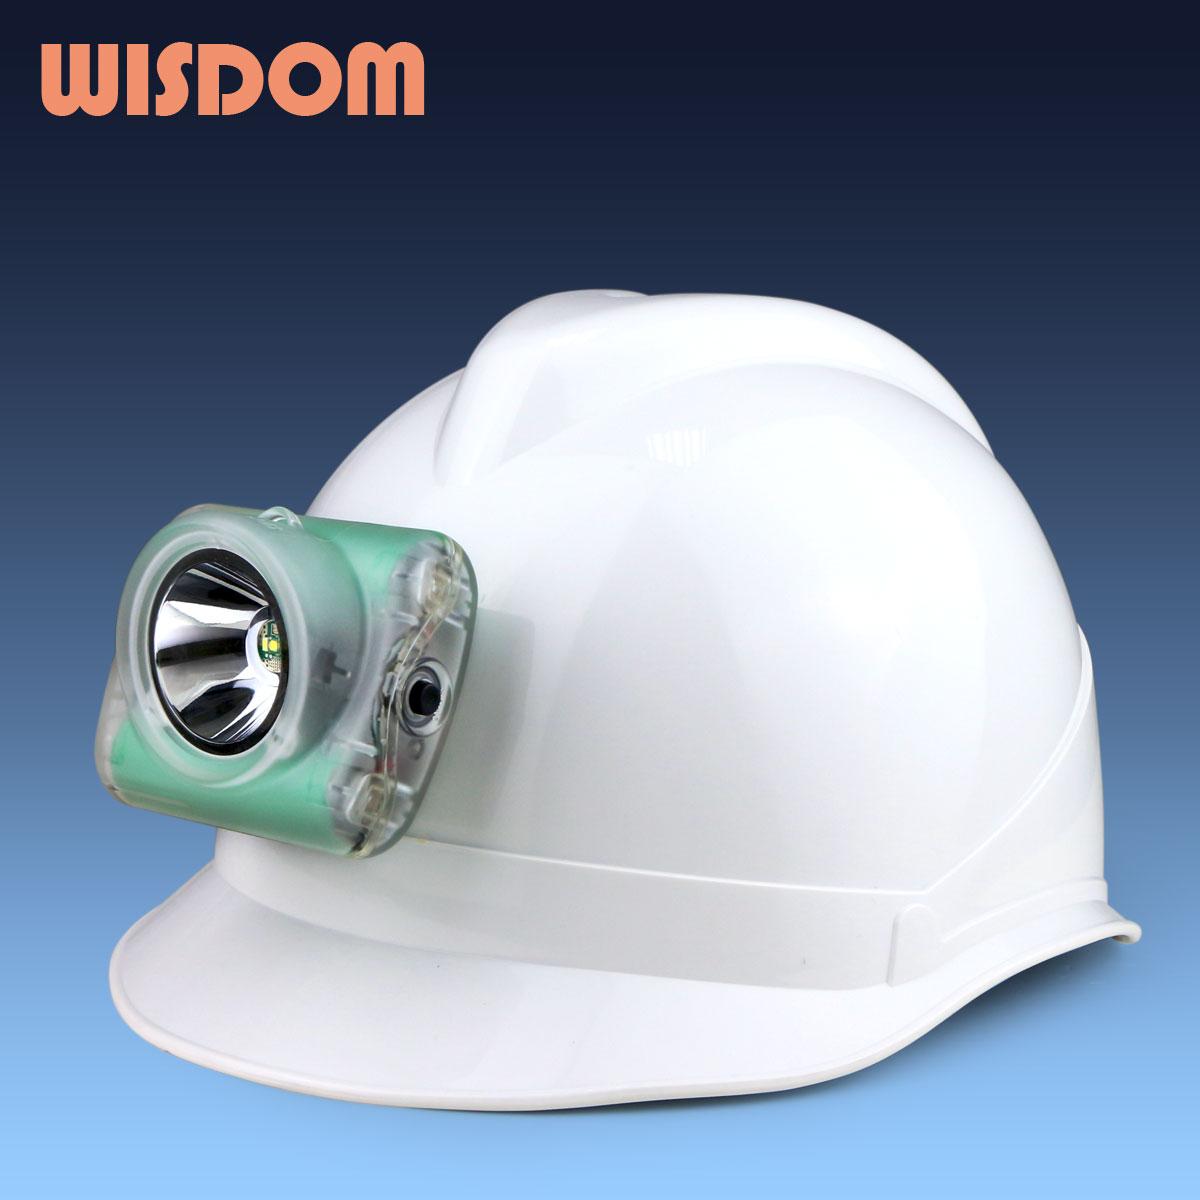 Wisdom Lamp 3 Led Projector Cordless Cap Lamp/led Mining Light ...